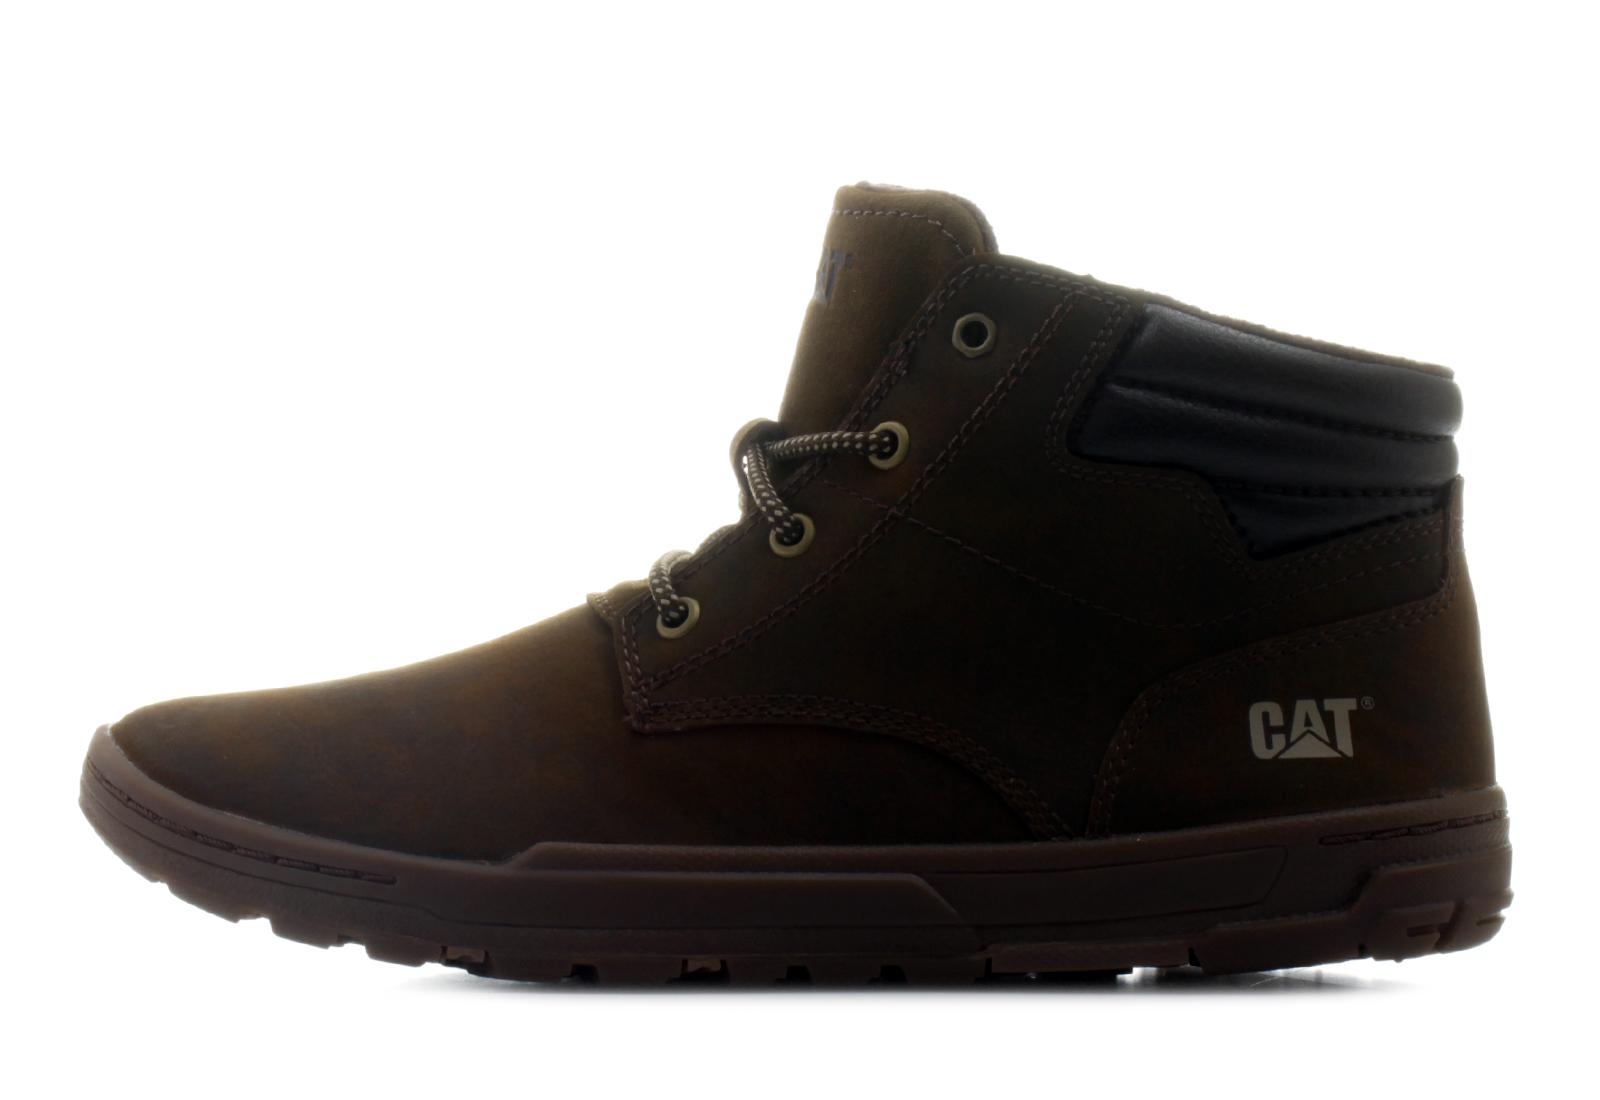 Cat Bakancs - Creedence - 721664-brn - Office Shoes Magyarország 2b9e24a4d2